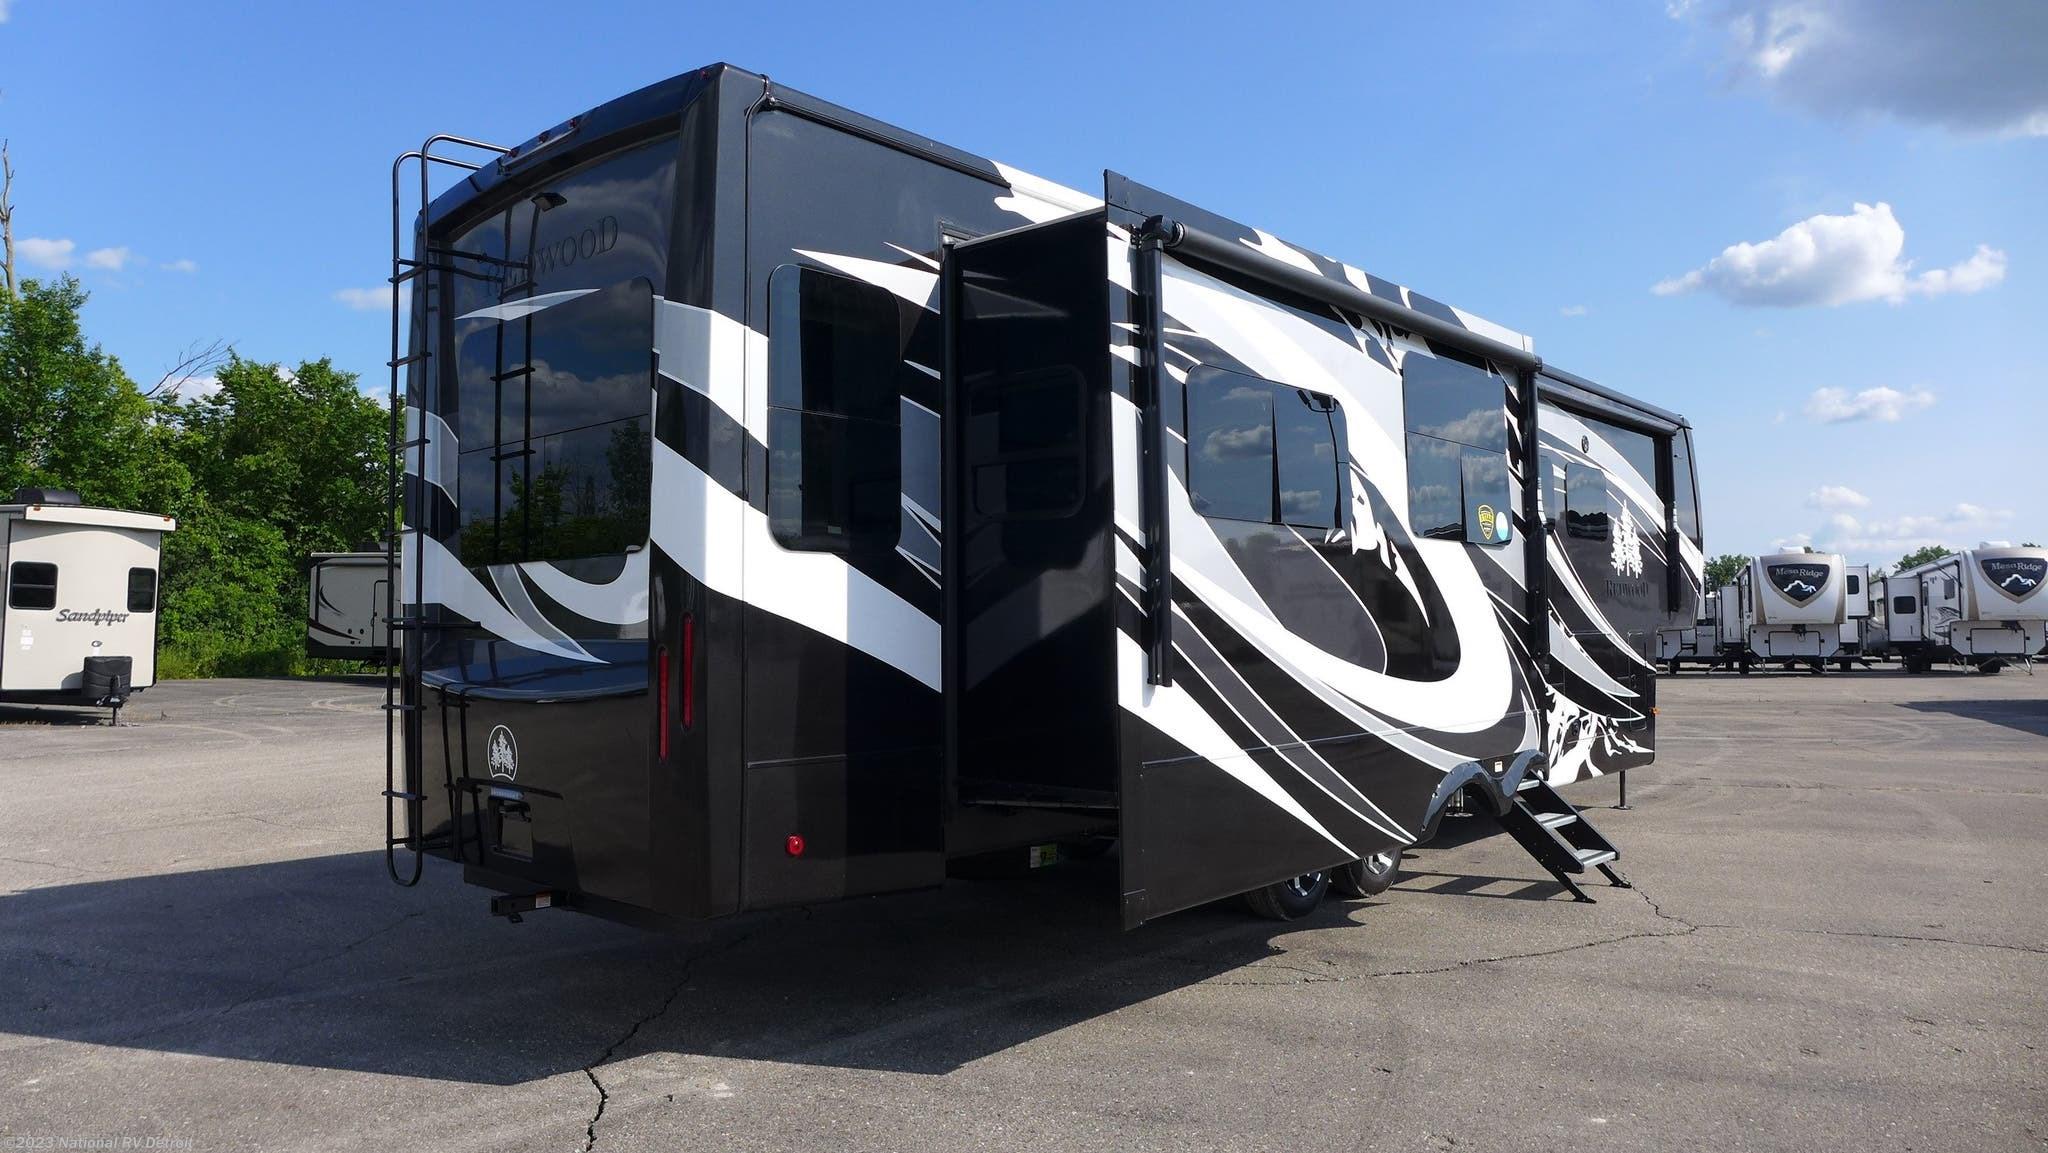 2020 Redwood RV RV 3901WB for Sale in Belleville, MI 48111 | 07209